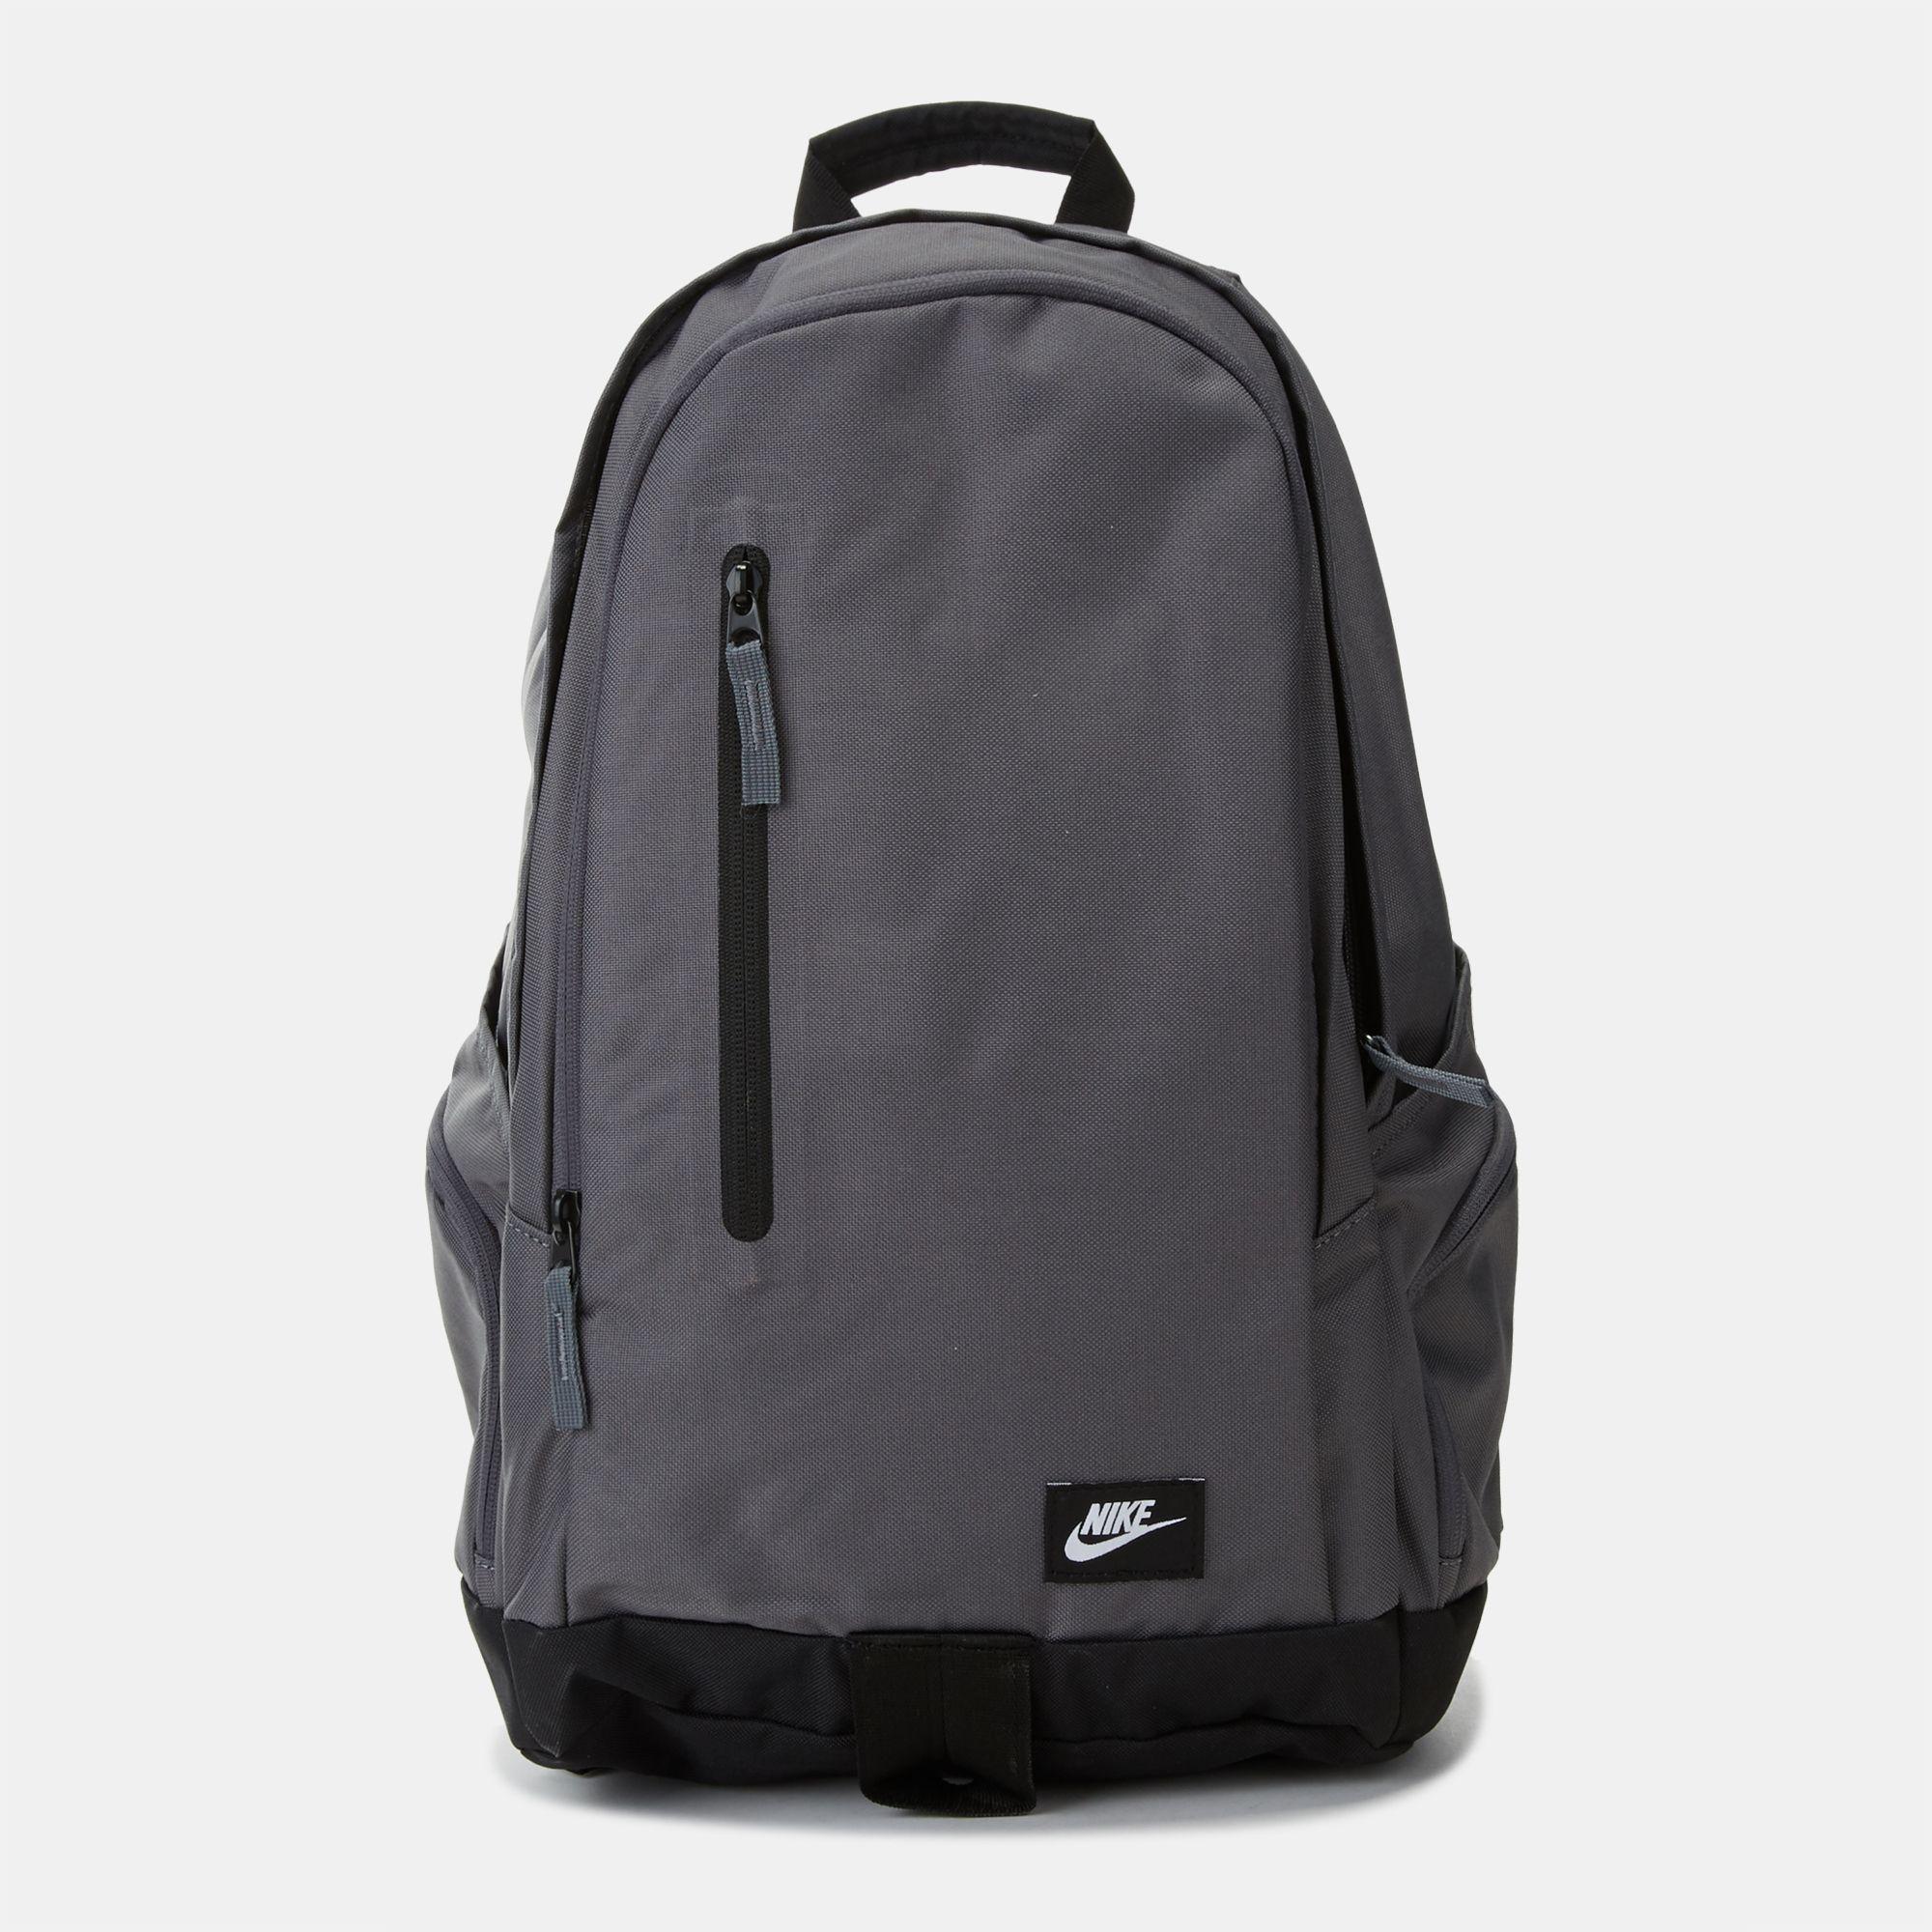 767356805a5d9 Nike All Access Fullfare Backpack - Grey